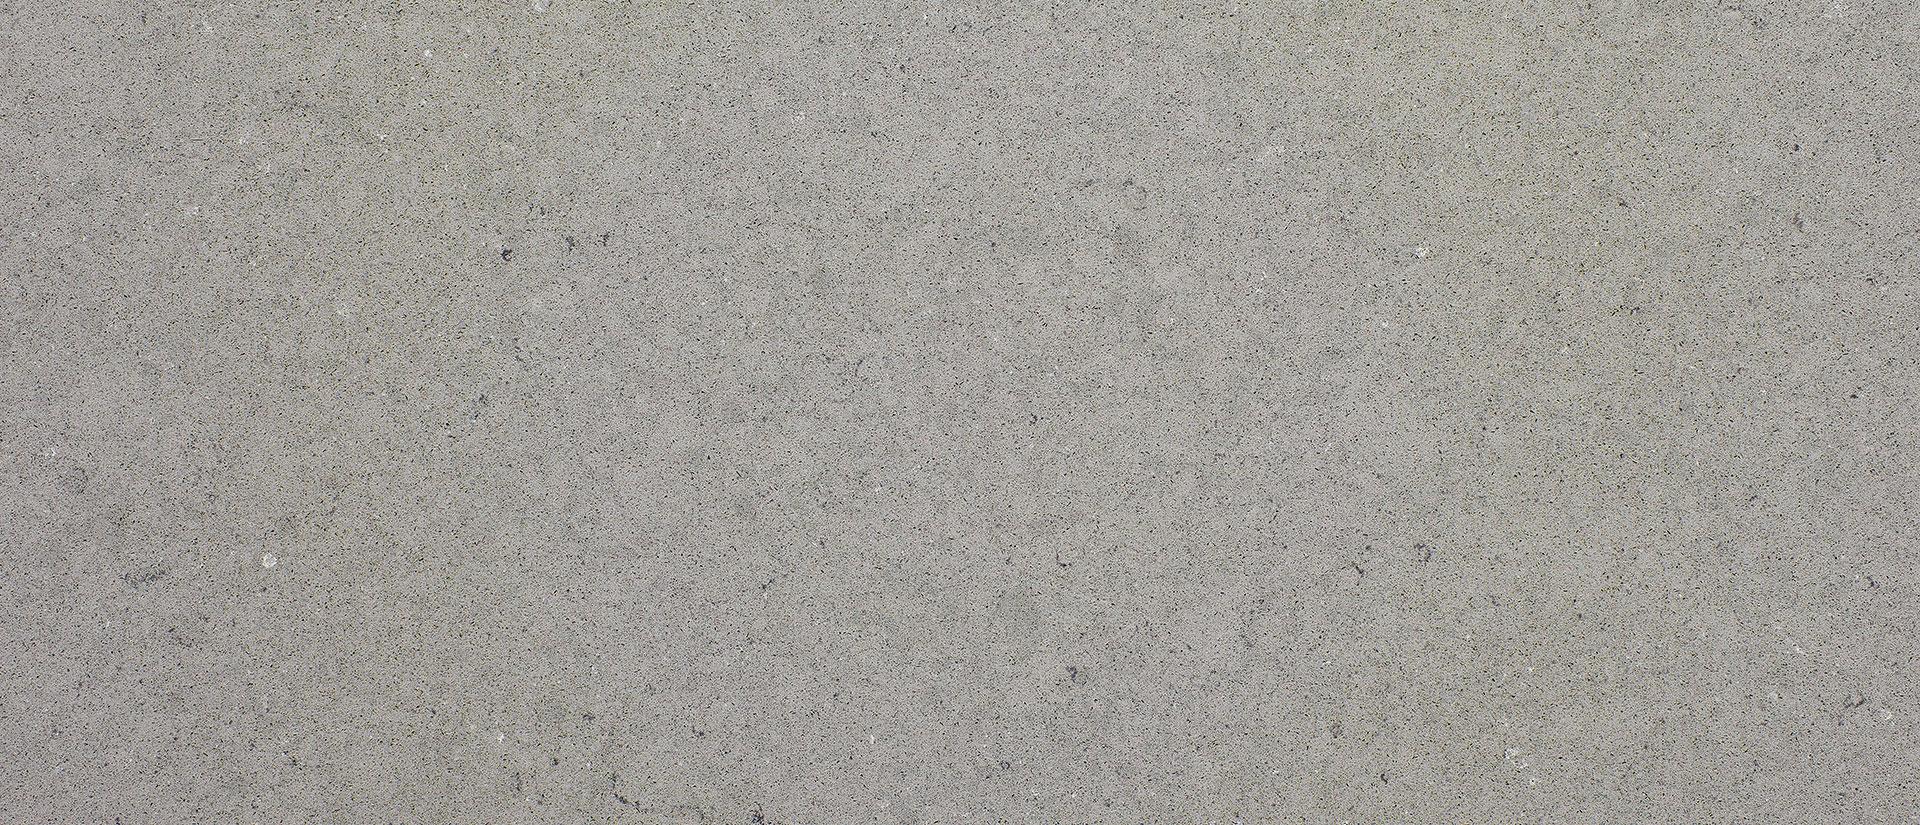 Fossil Gray Quartz Countertop Kitchen Cabinets Amp Tiles